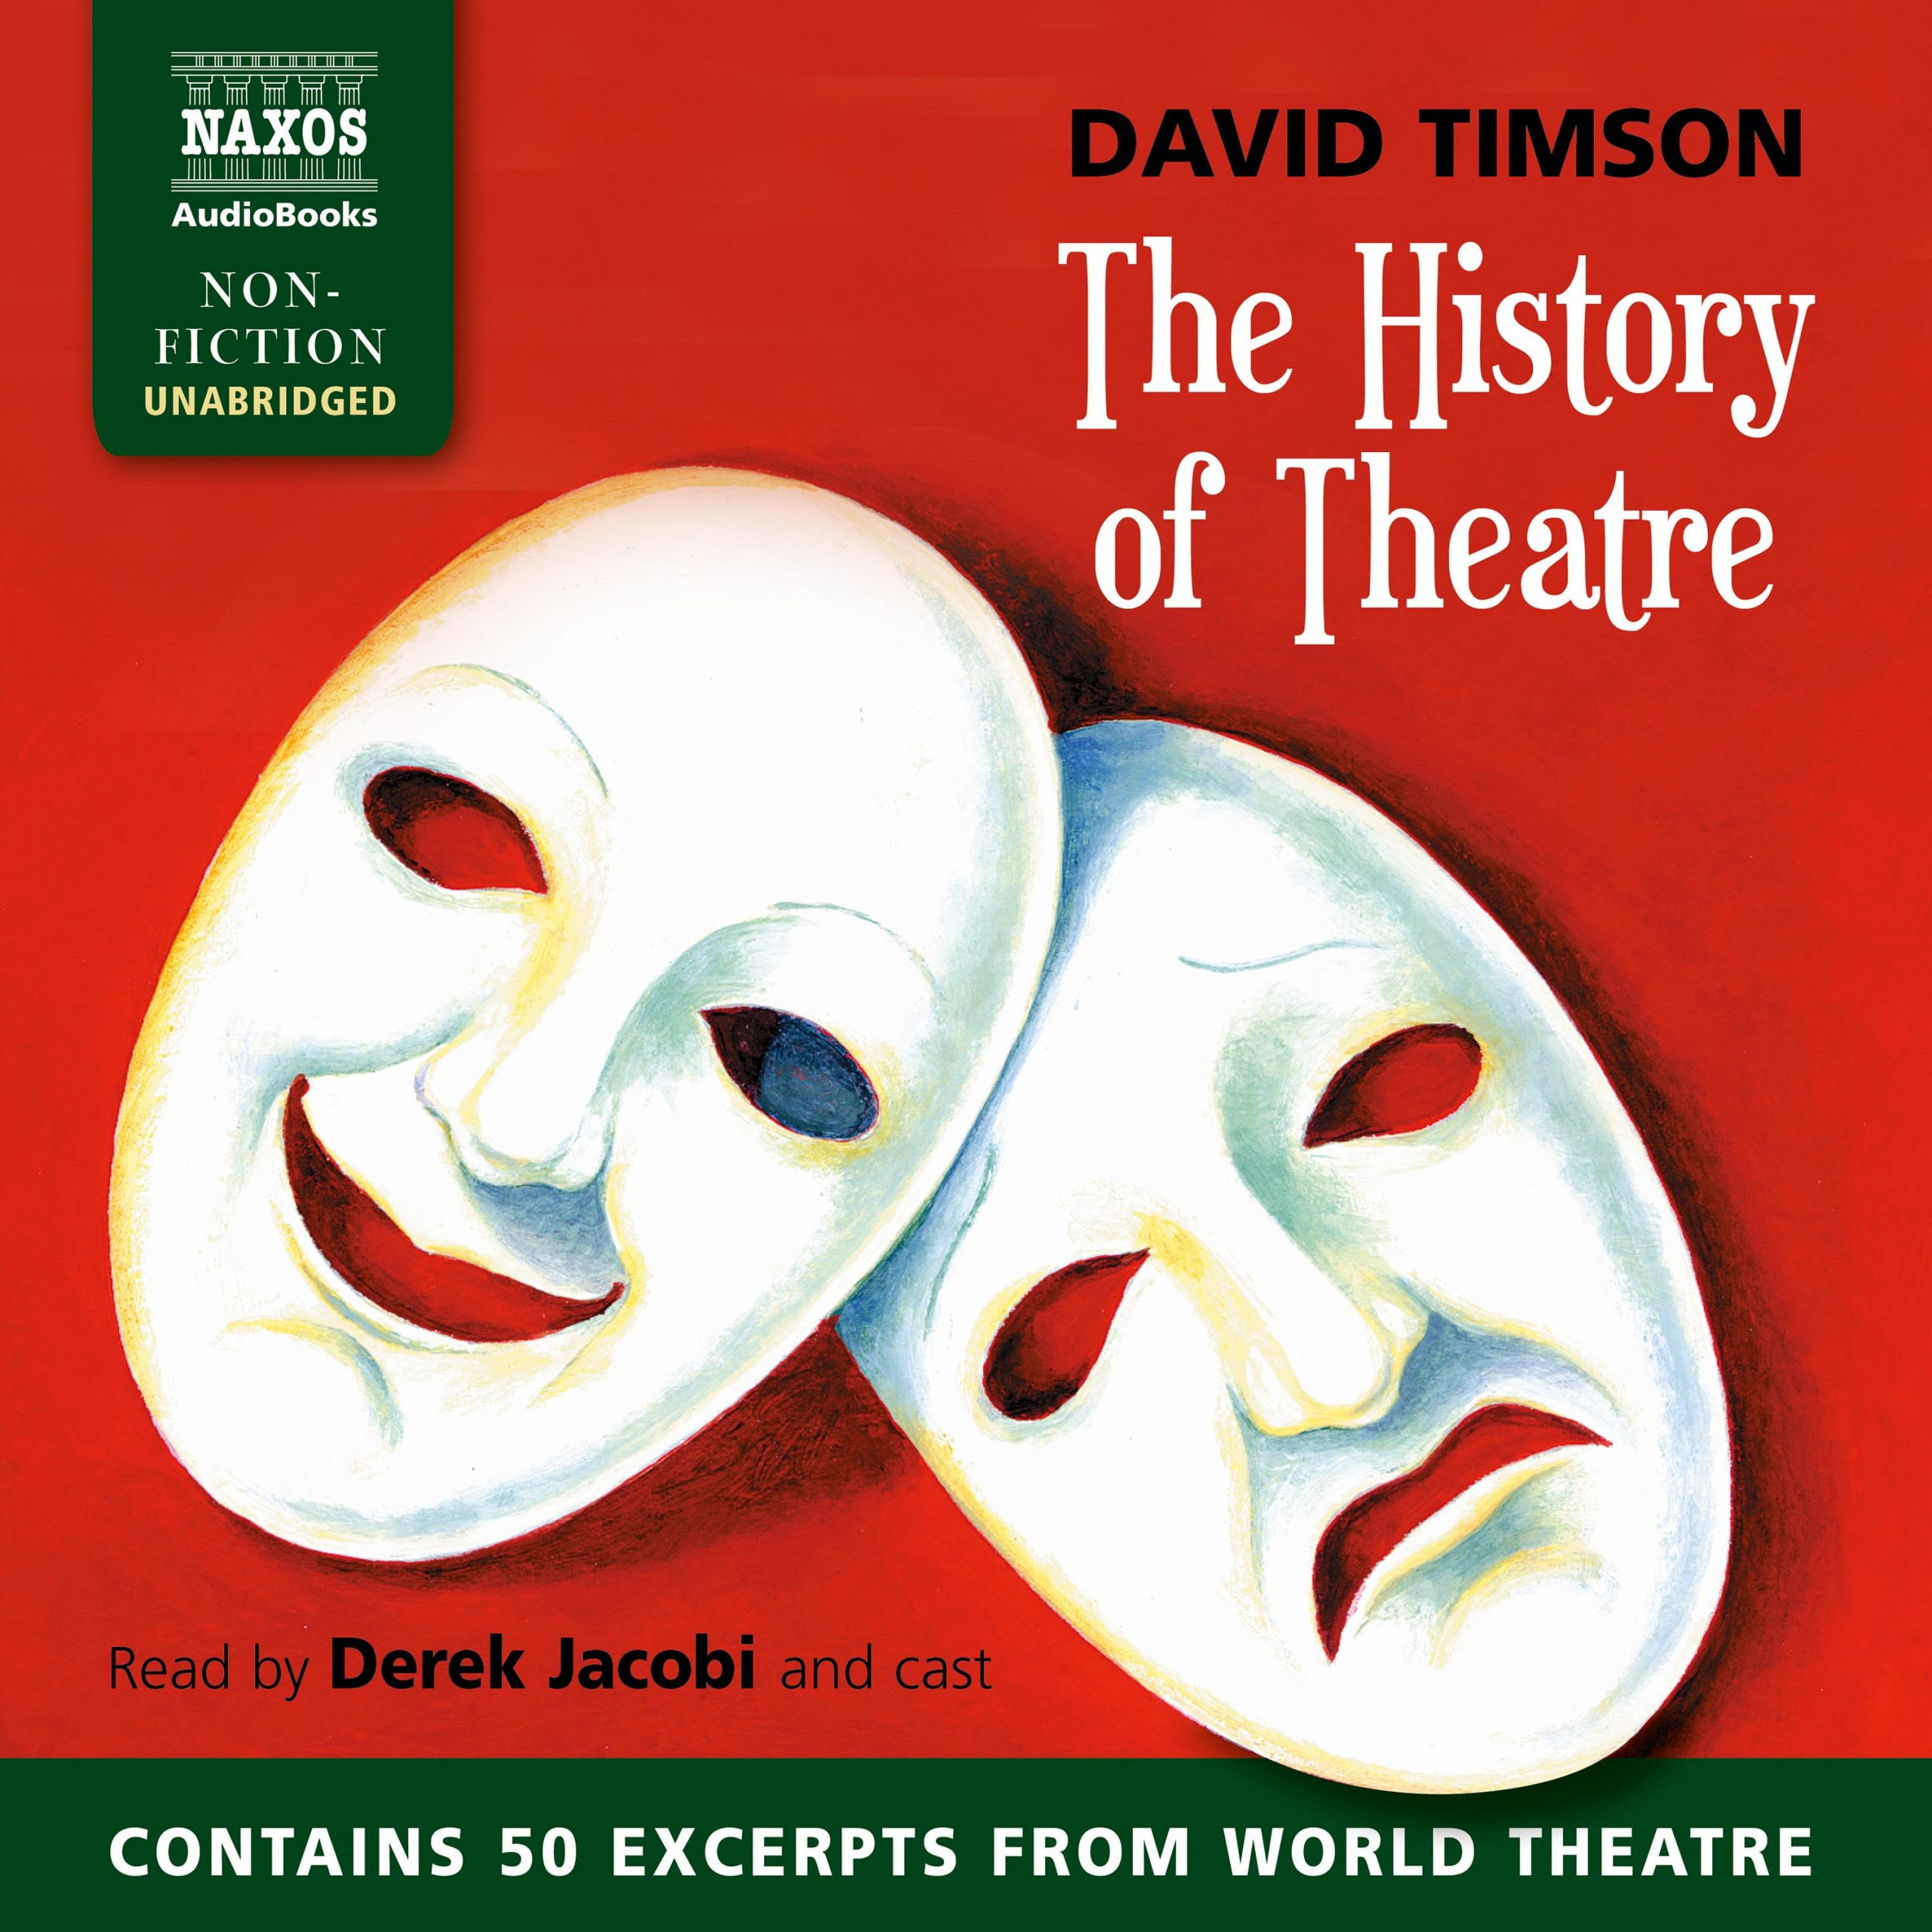 The History of Theatre (unabridged)